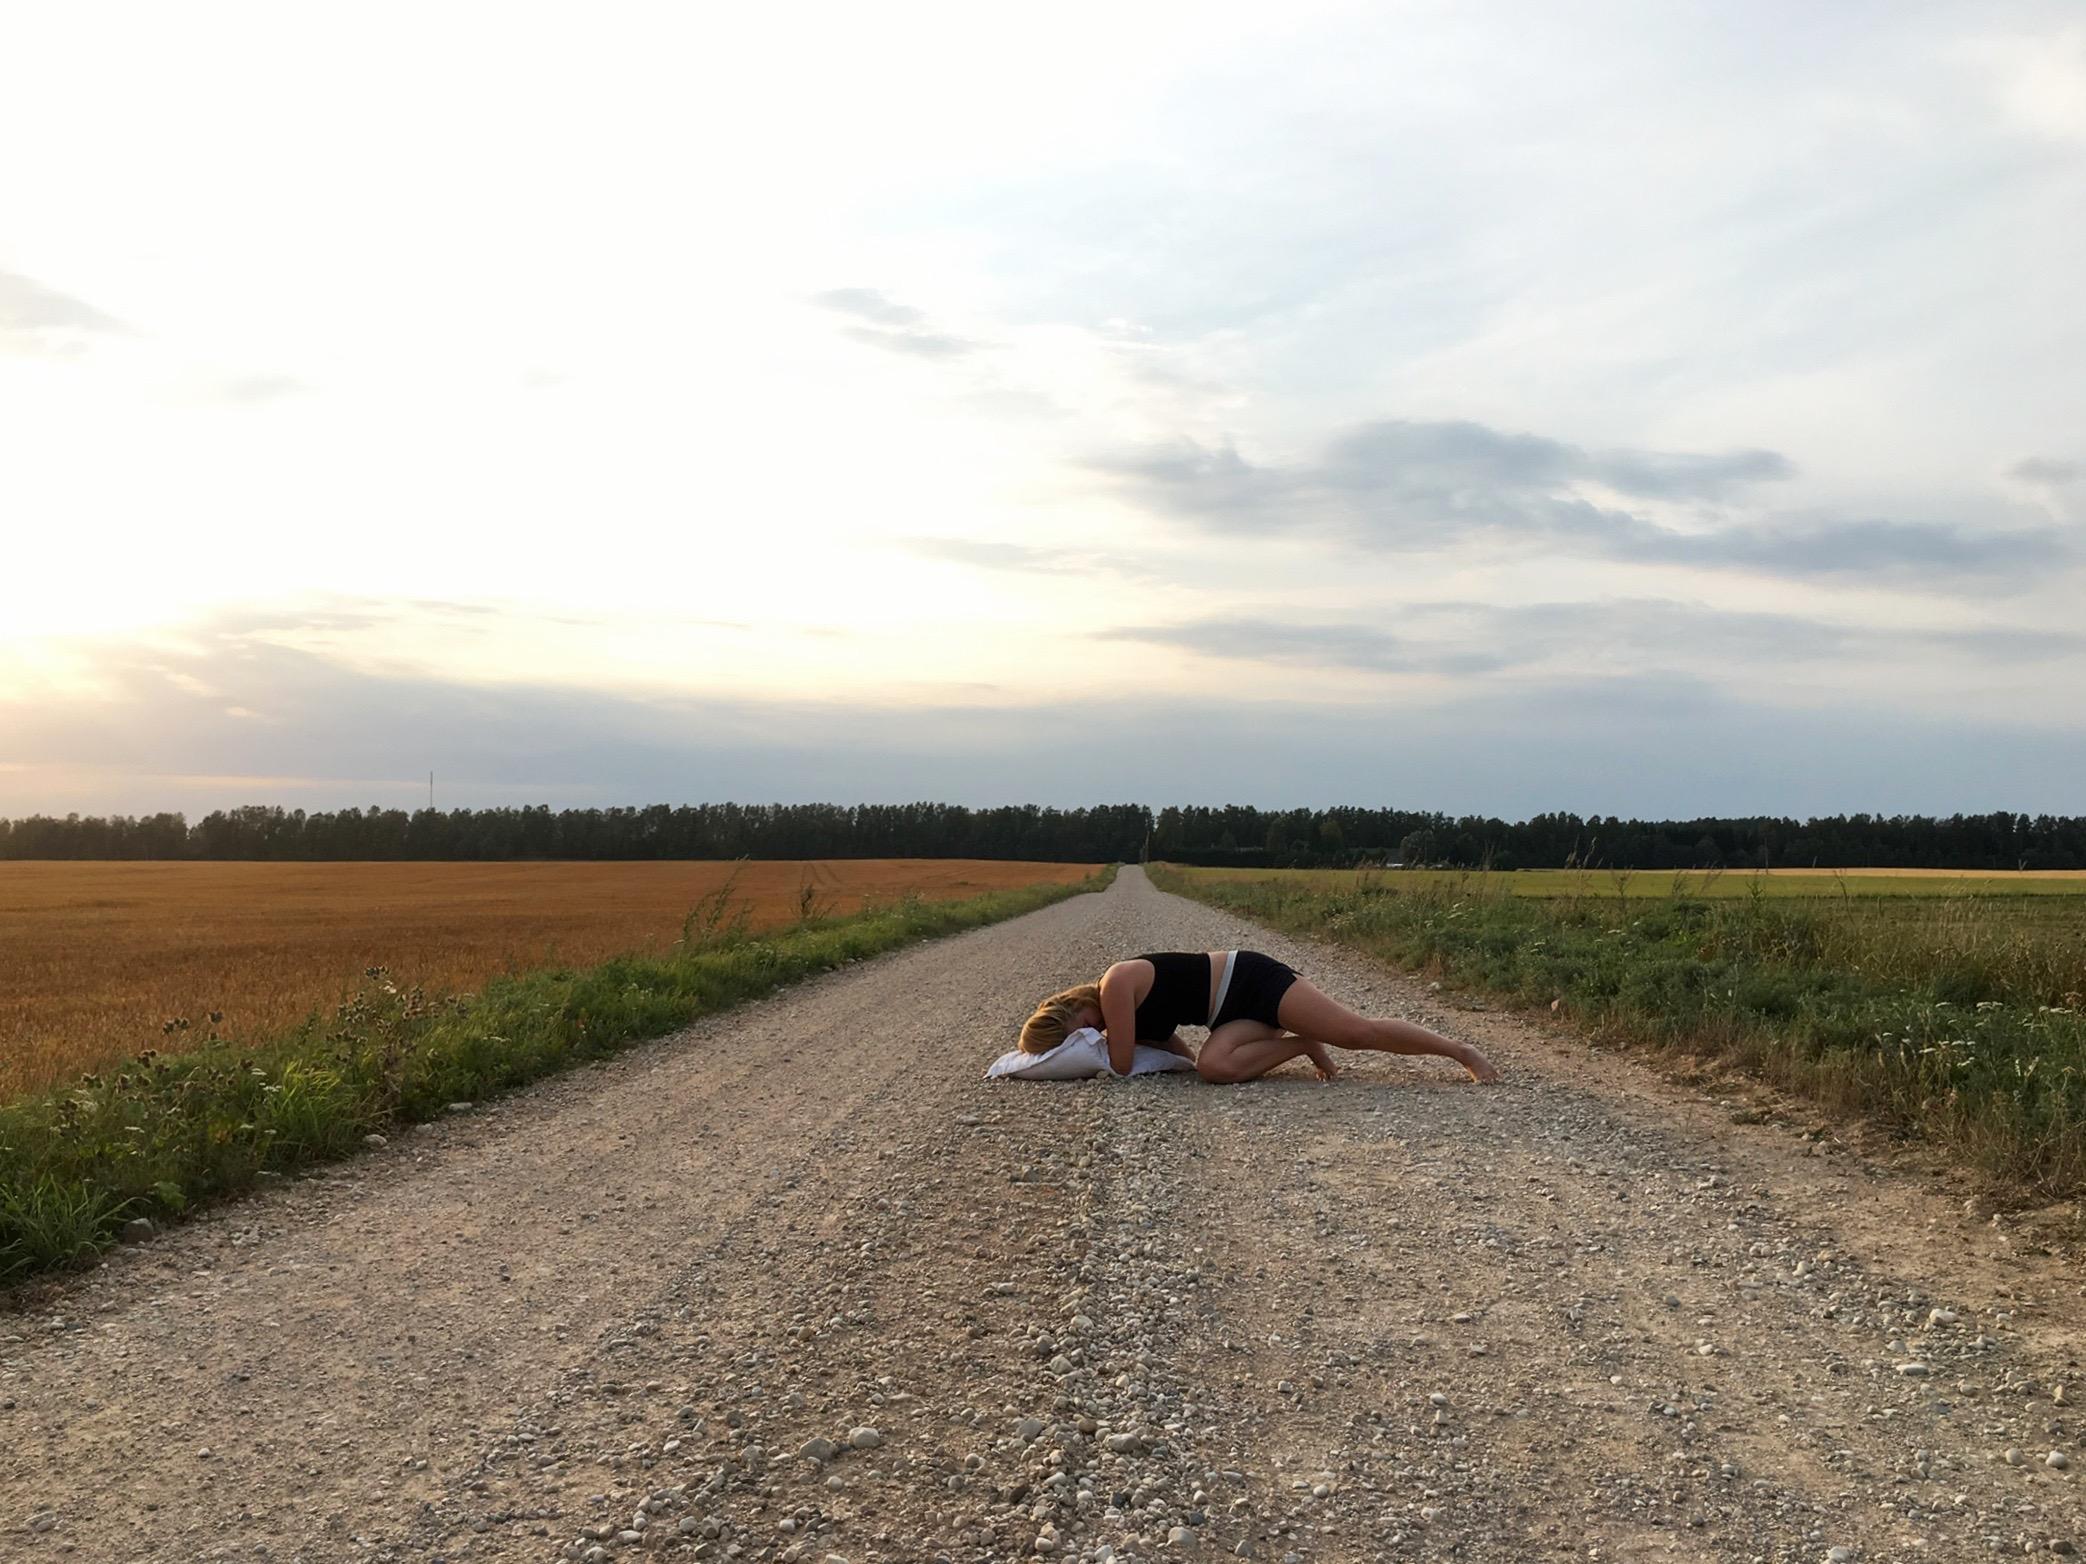 pillow_estonia1 (2).jpg